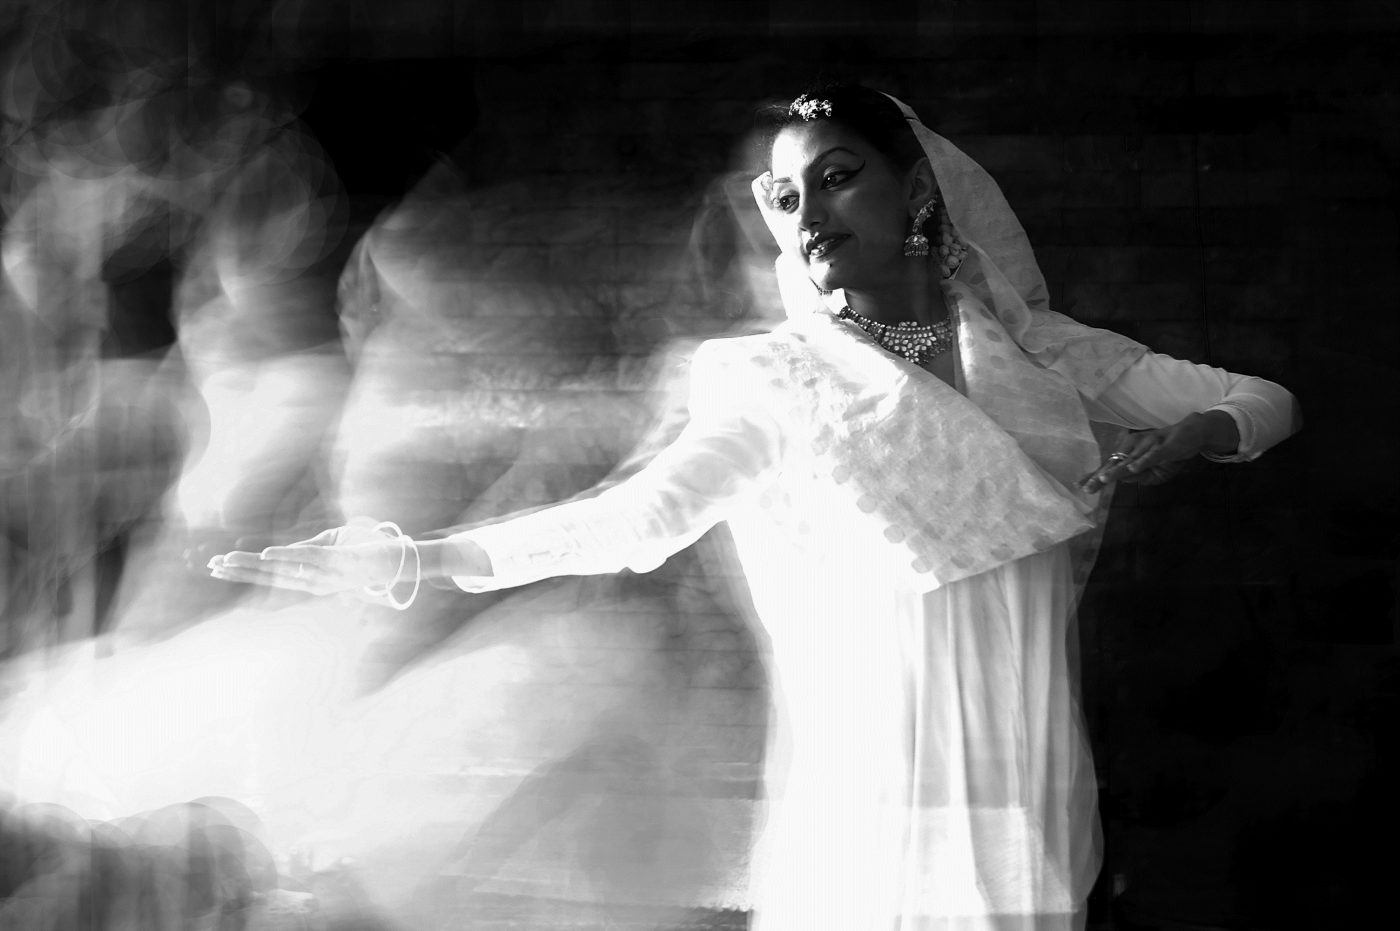 dance-1182283, photographer sri vatsa (sriimage)